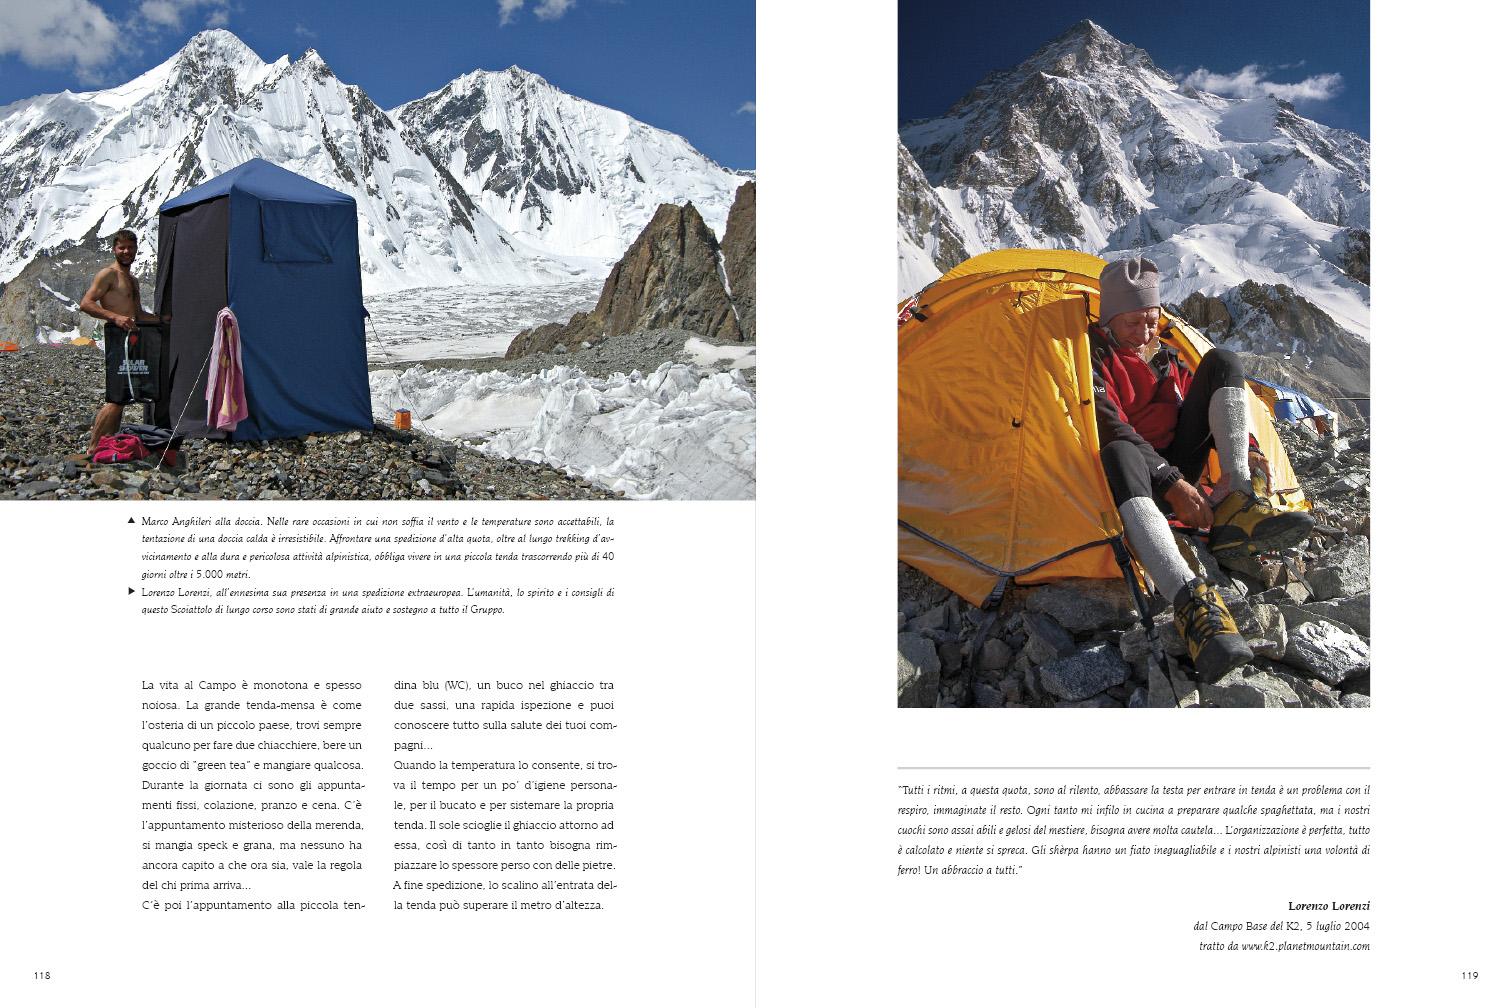 K2 EXPEDITION 1954-2004 Giuseppe Ghedina Fotografo - 061.jpg